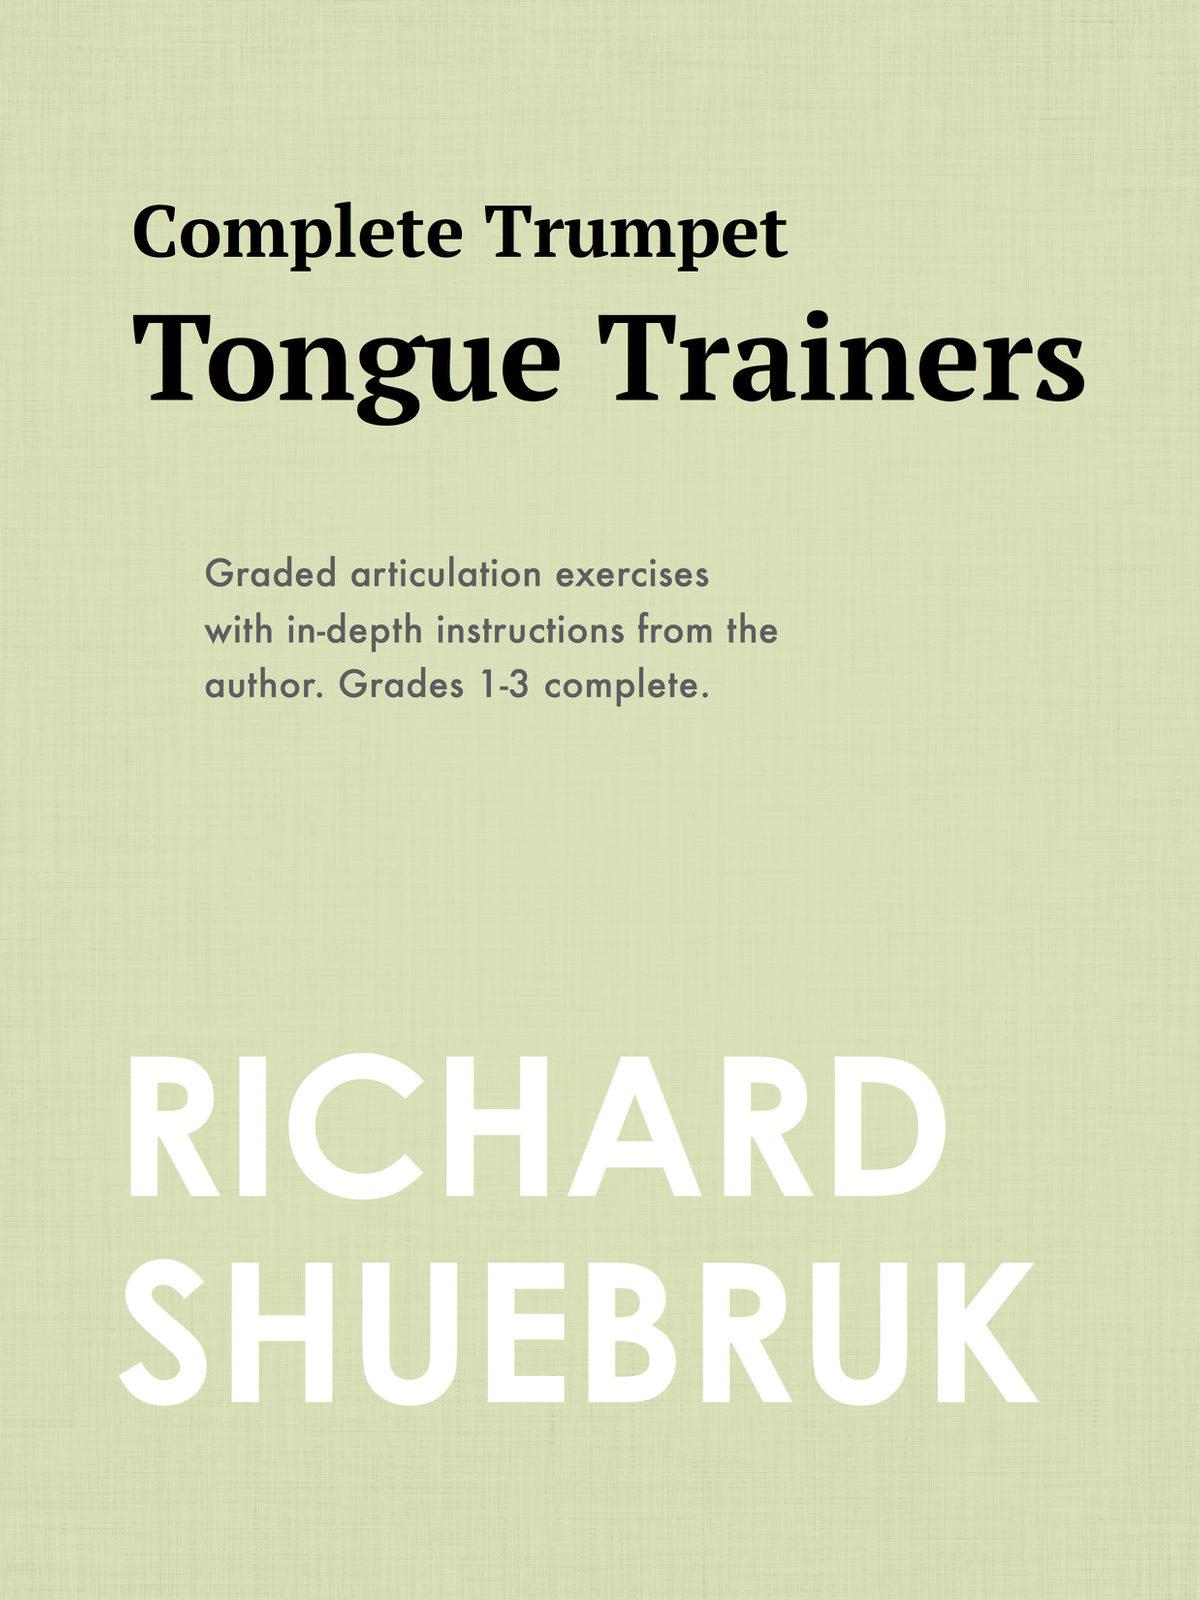 Shuebruk, Tongue Trainers for Trumpet-p01